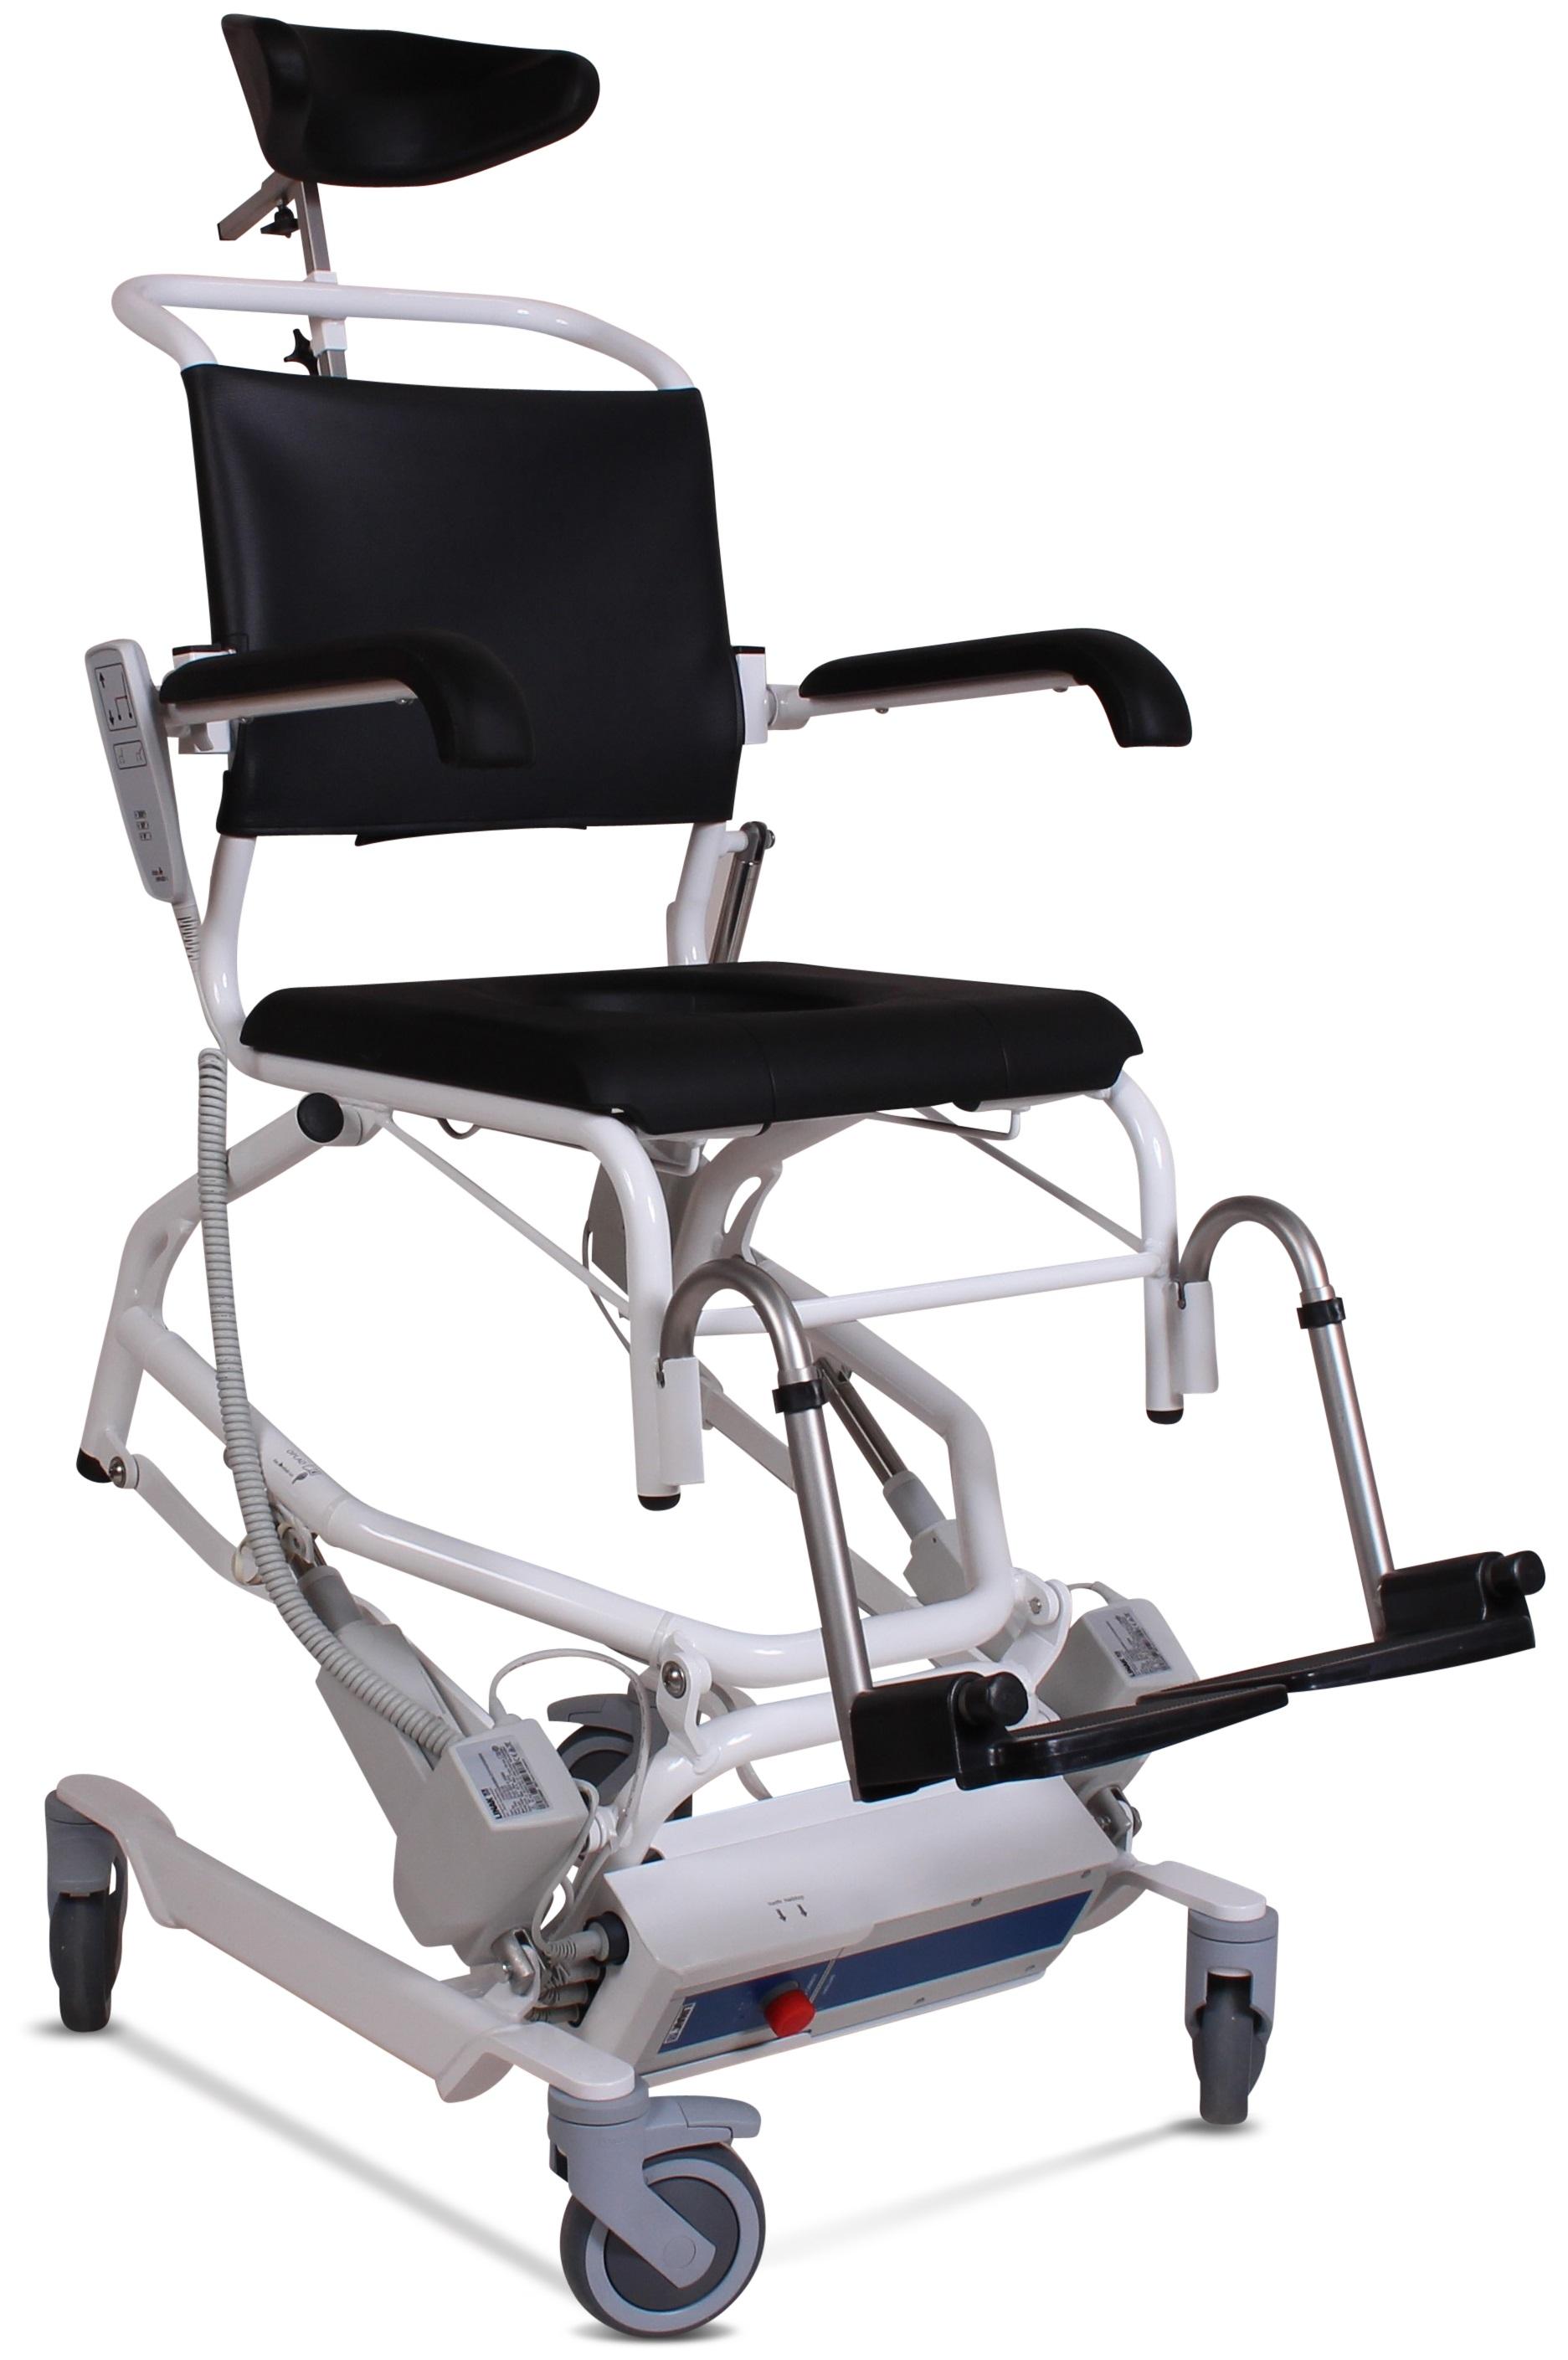 ... ERGOtip 5 EL Reclining Commode u0026 Shower Chair ... & AssistData - ERGOtip 5 EL Reclining Commode u0026 Shower Chair from ... islam-shia.org